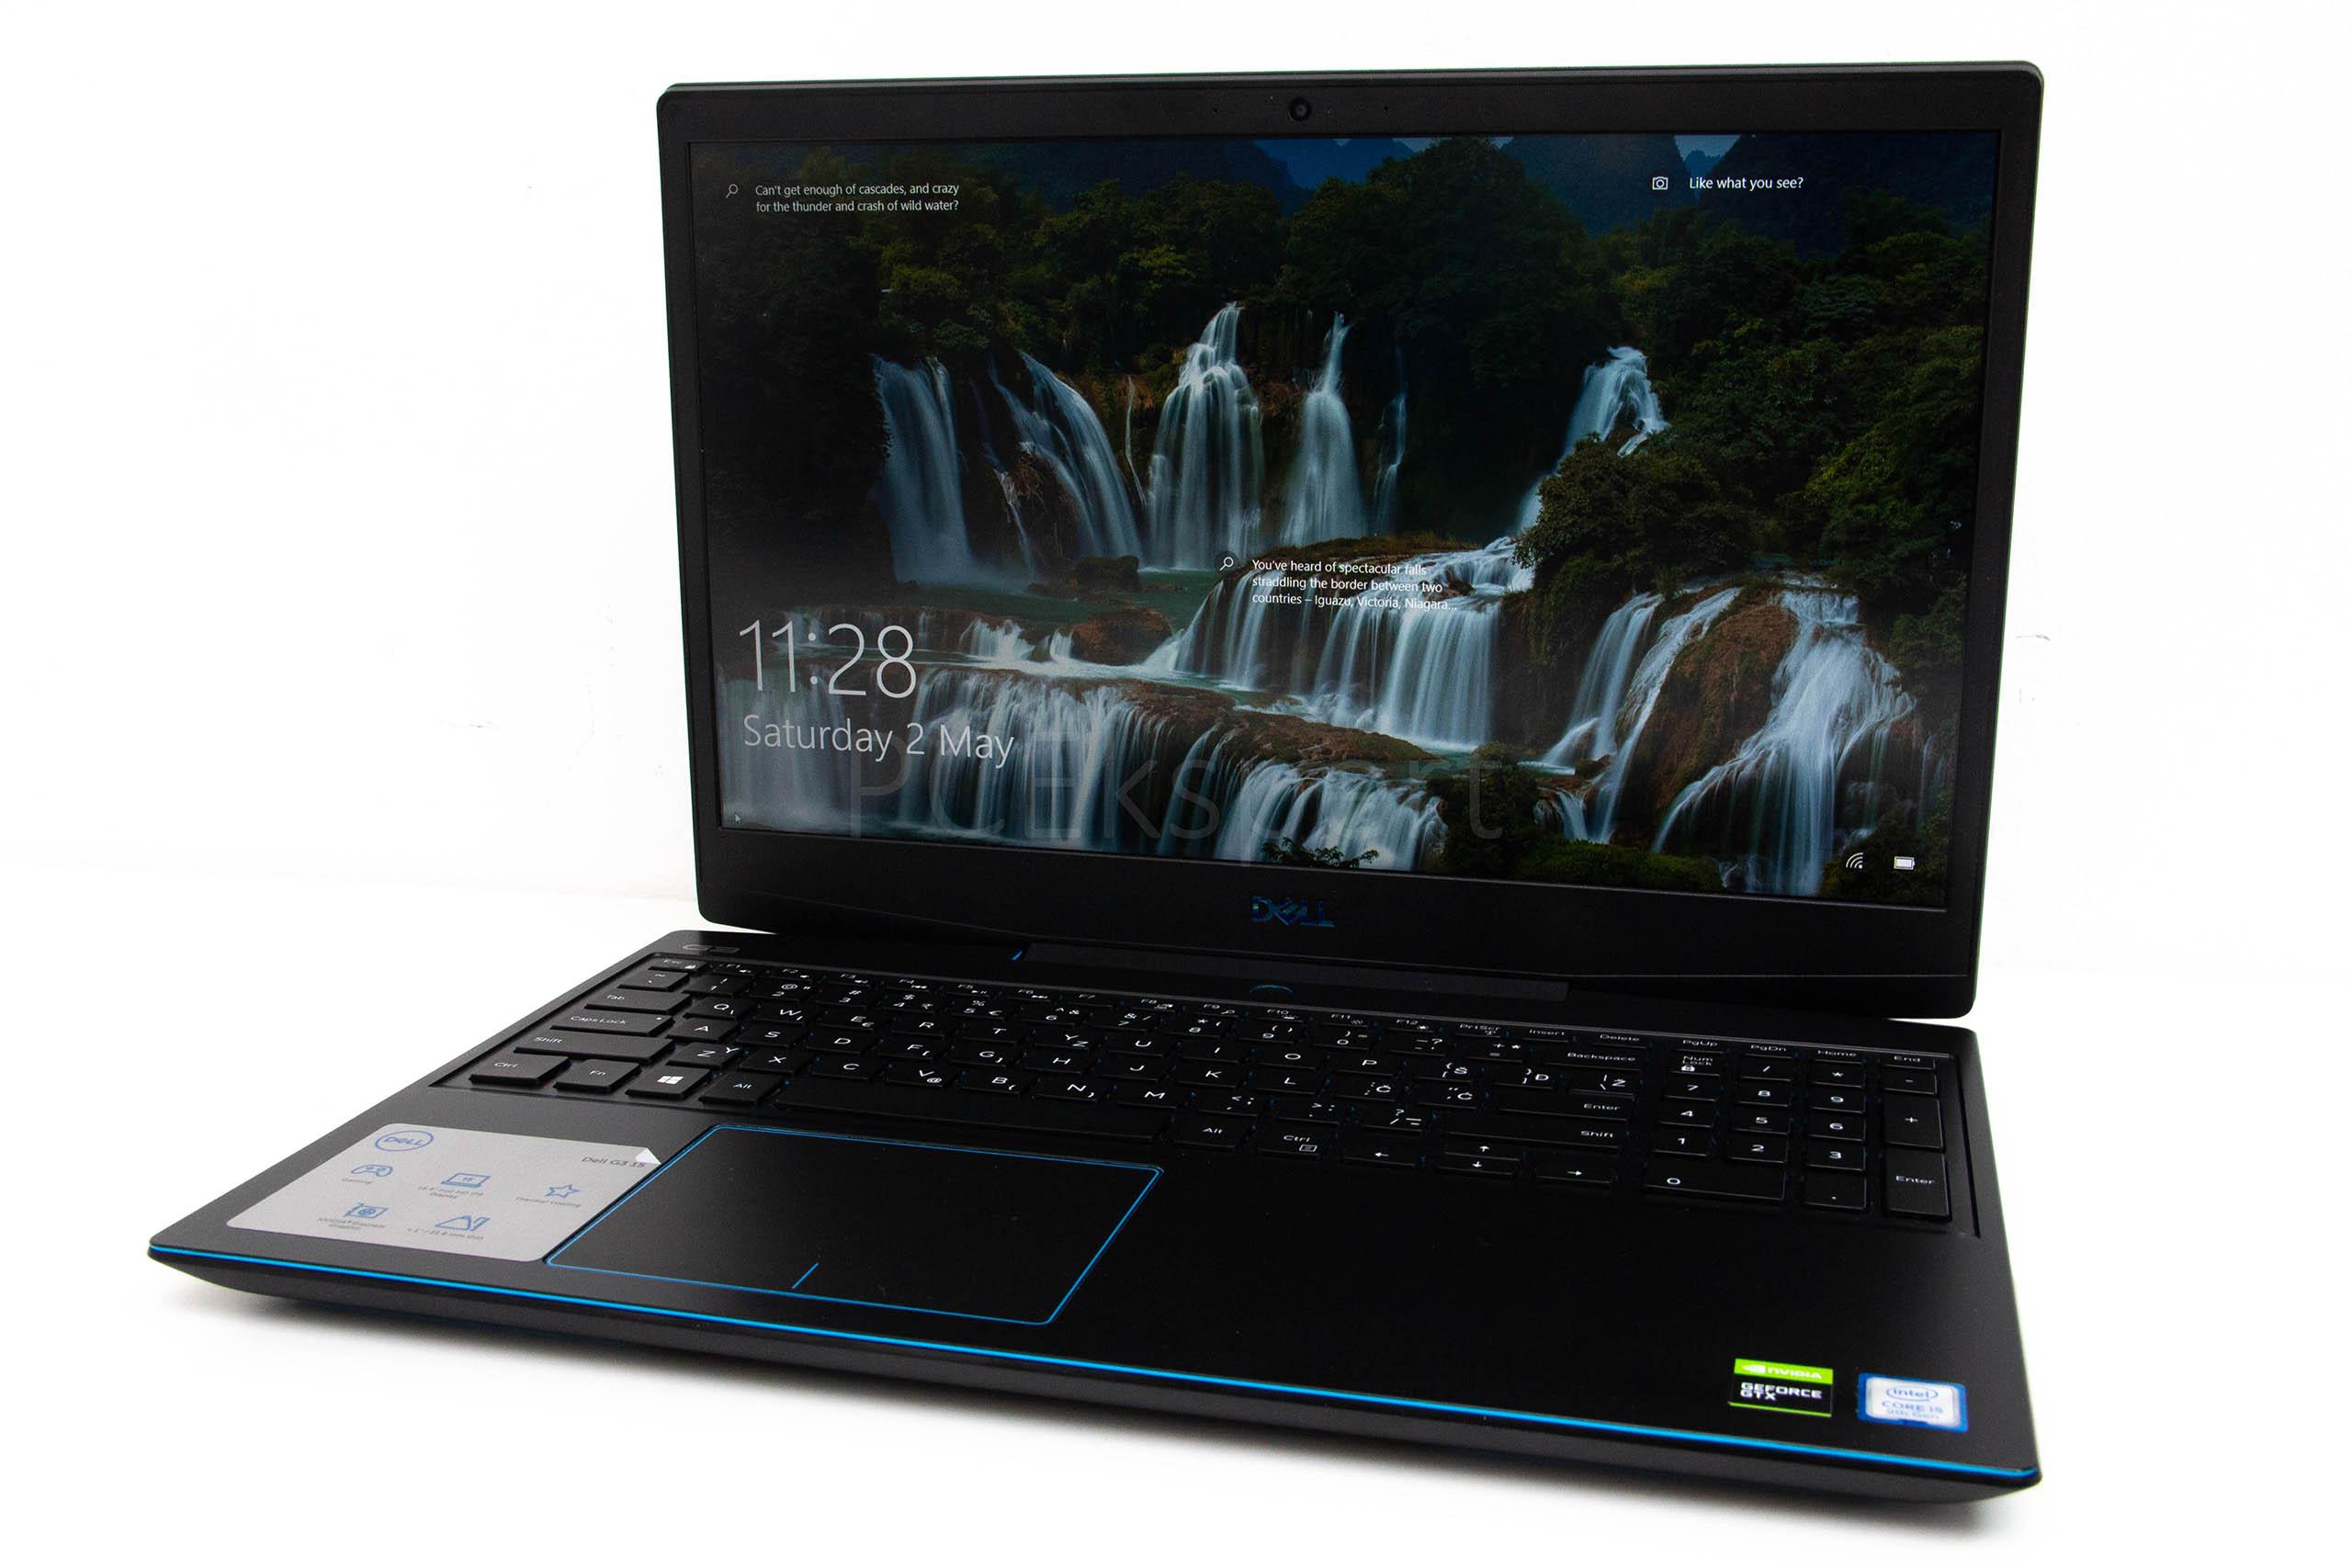 Dell Inspiron 3590 G3 recenzija